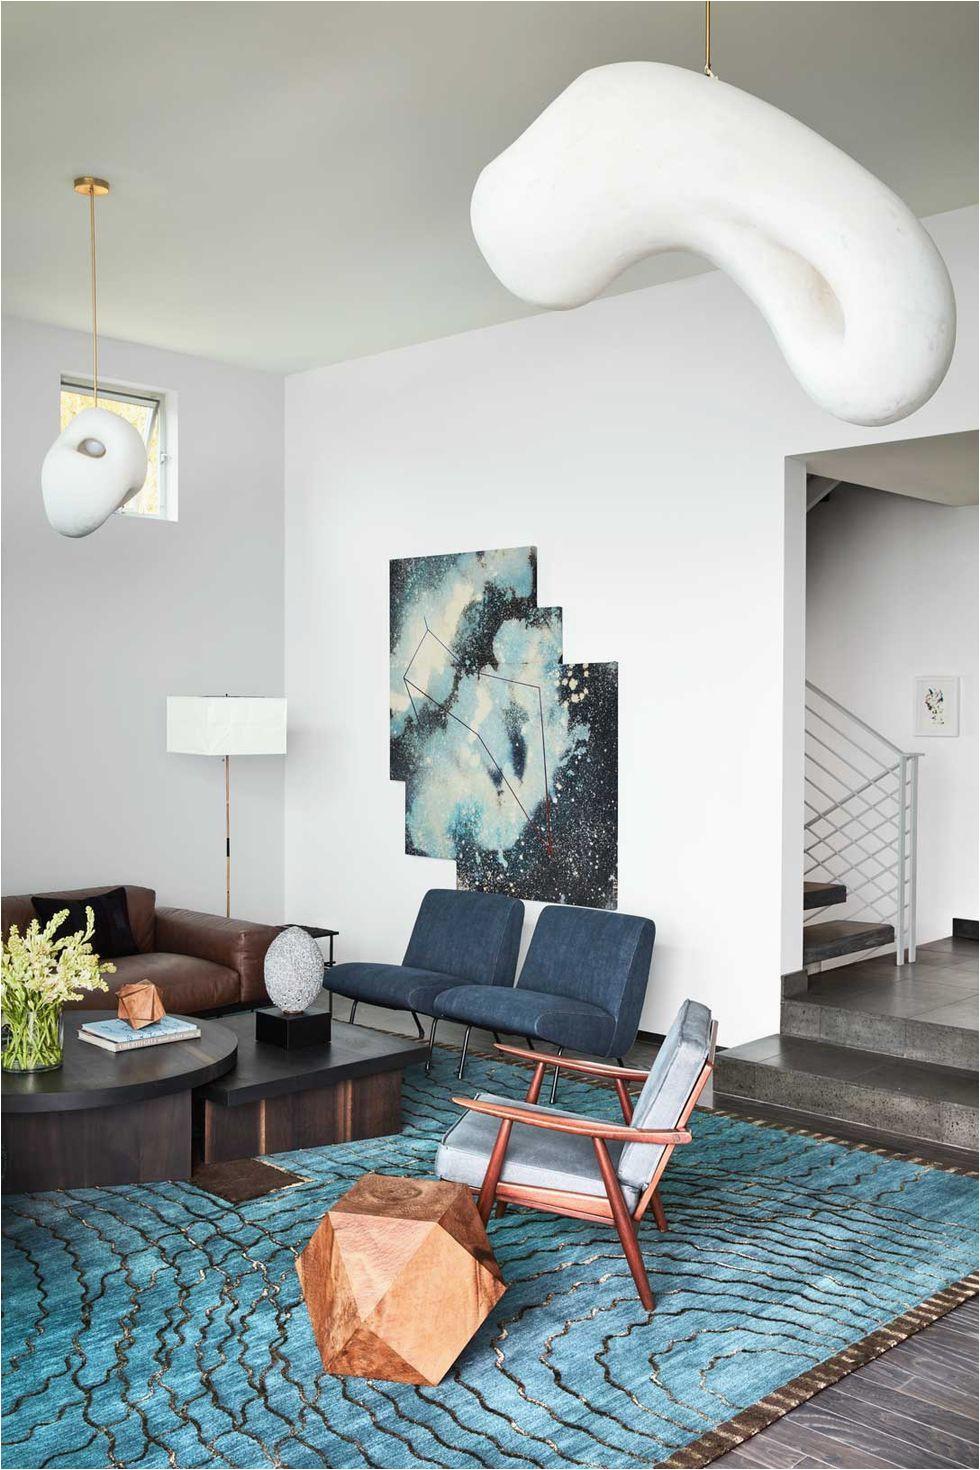 Black area Rugs for Living Room 51 Living Room Rug Ideas Stylish area Rugs for Living Rooms